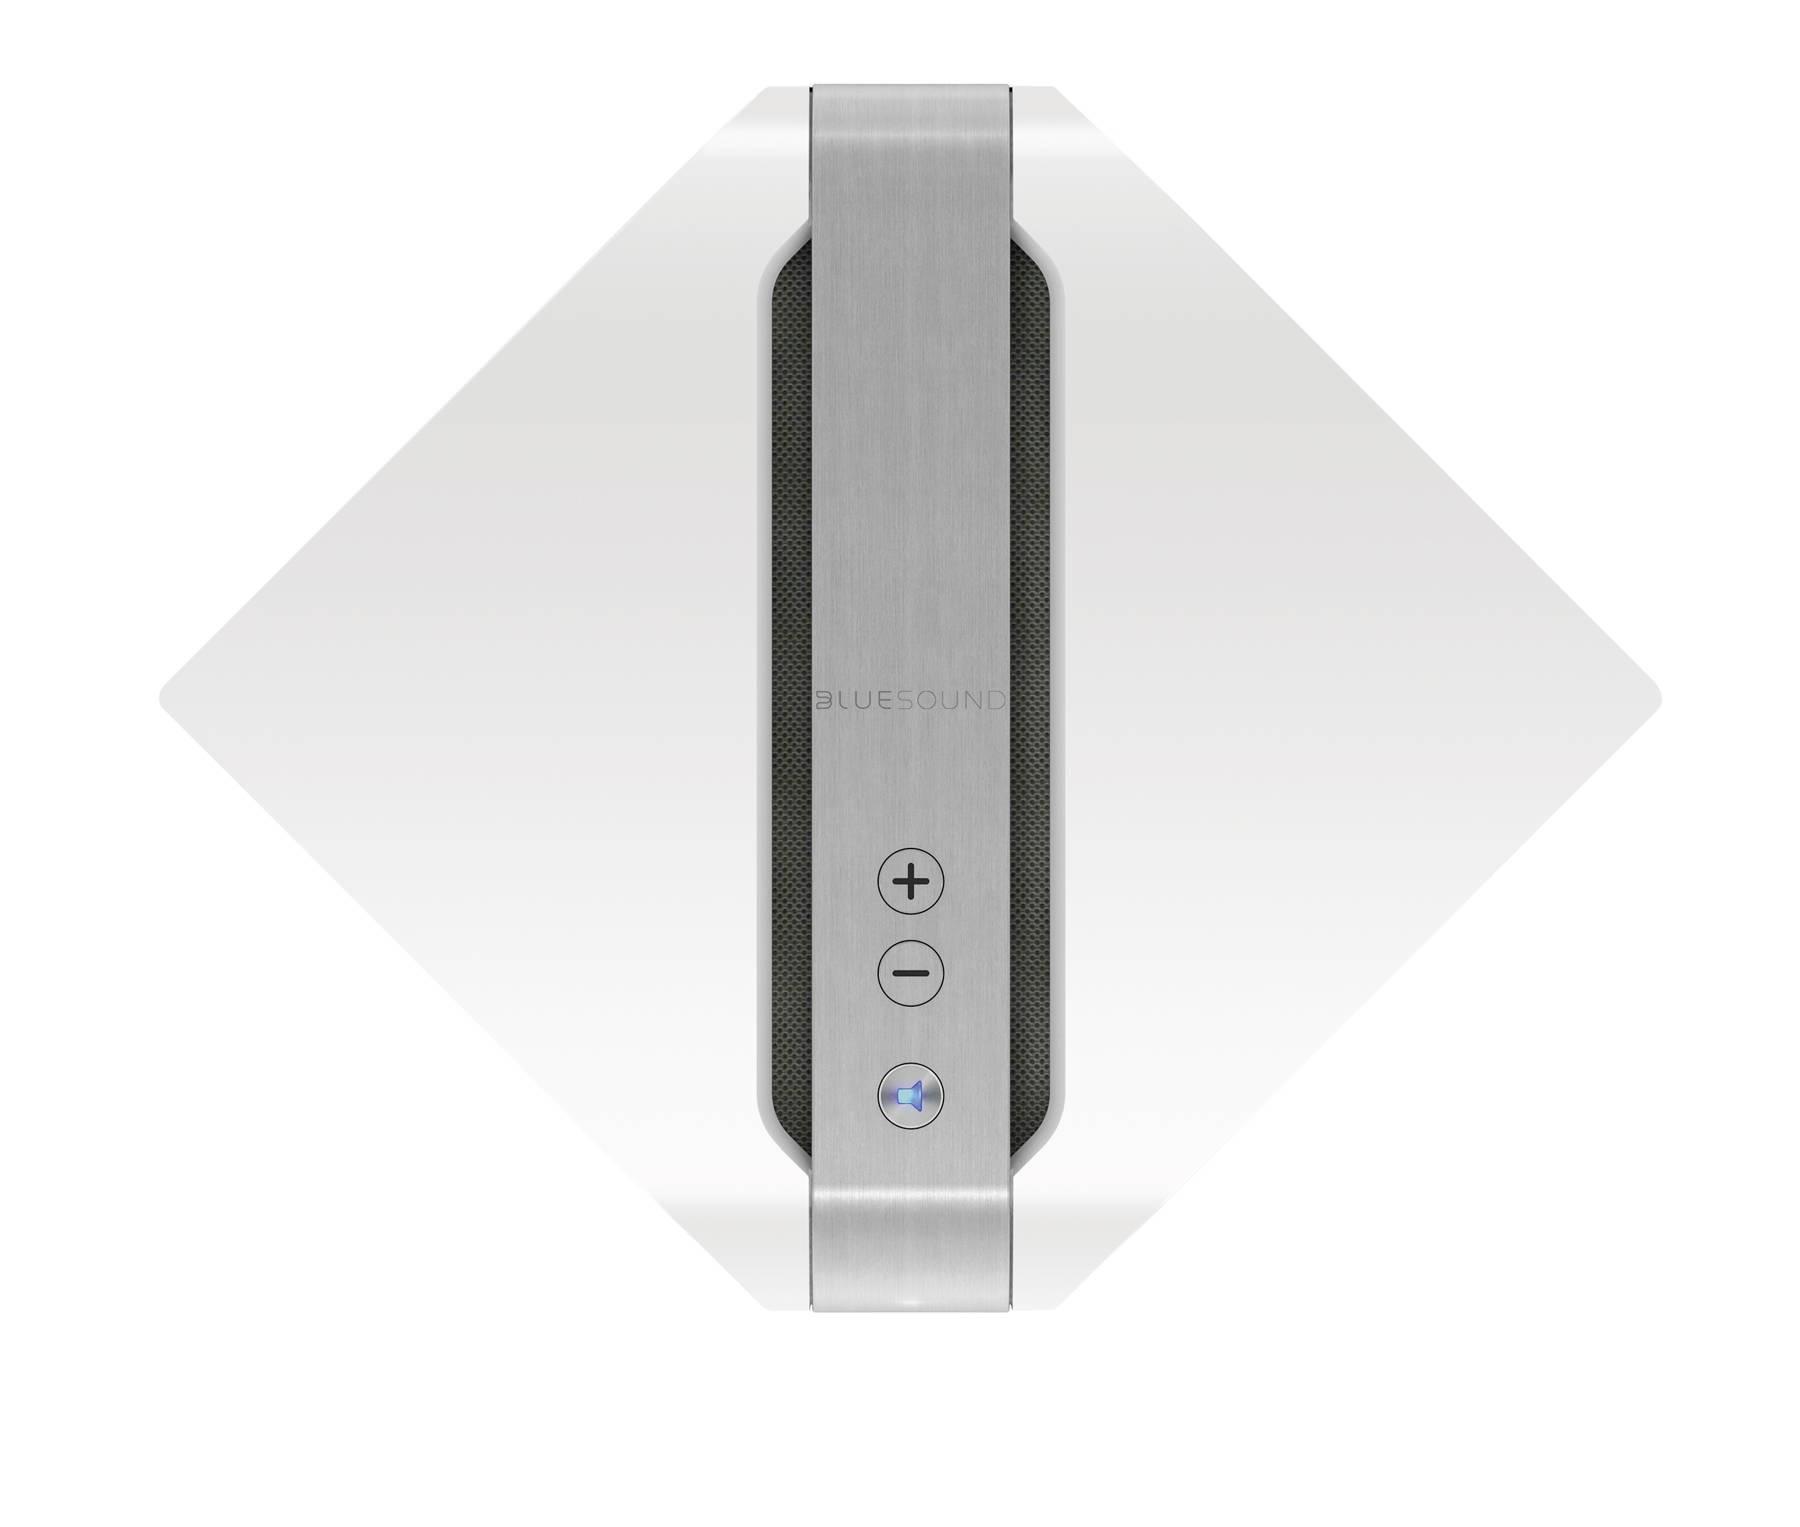 купить Активная акустика мультирум Bluesound POWERNODE N150 Gloss white онлайн